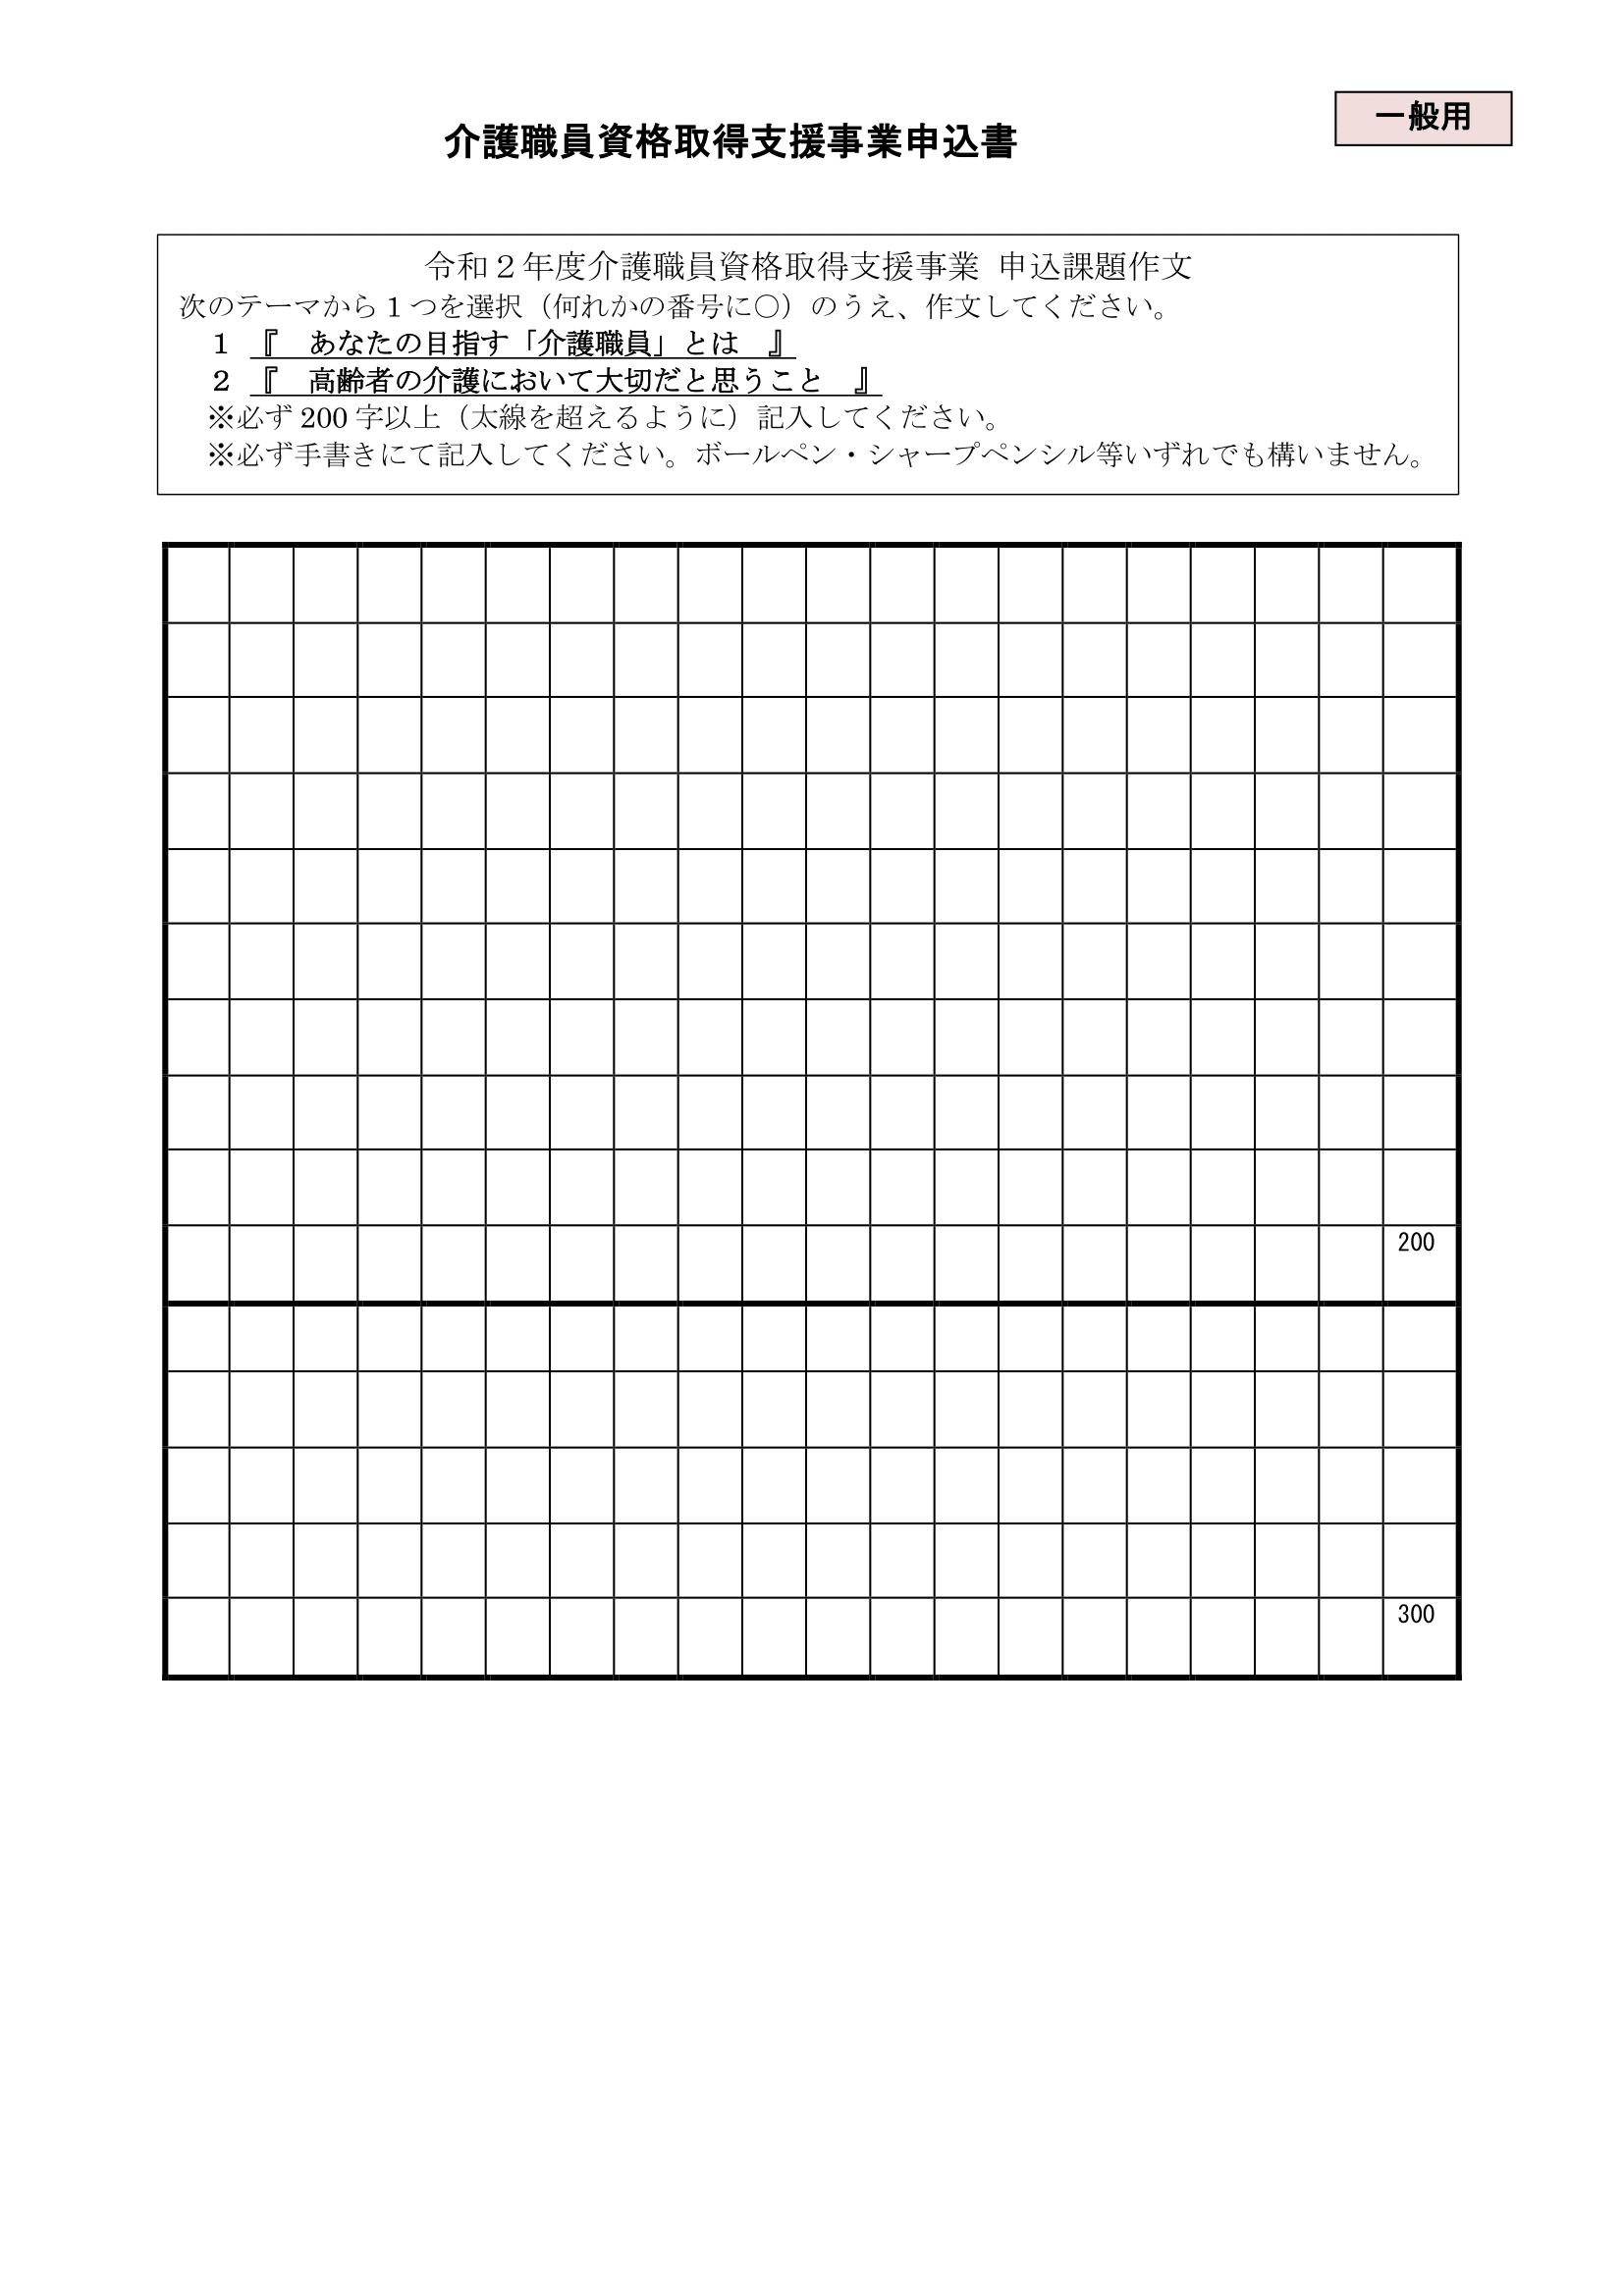 雉・シ蜿門セ玲髪謠エ2020縲€・匁椢-6